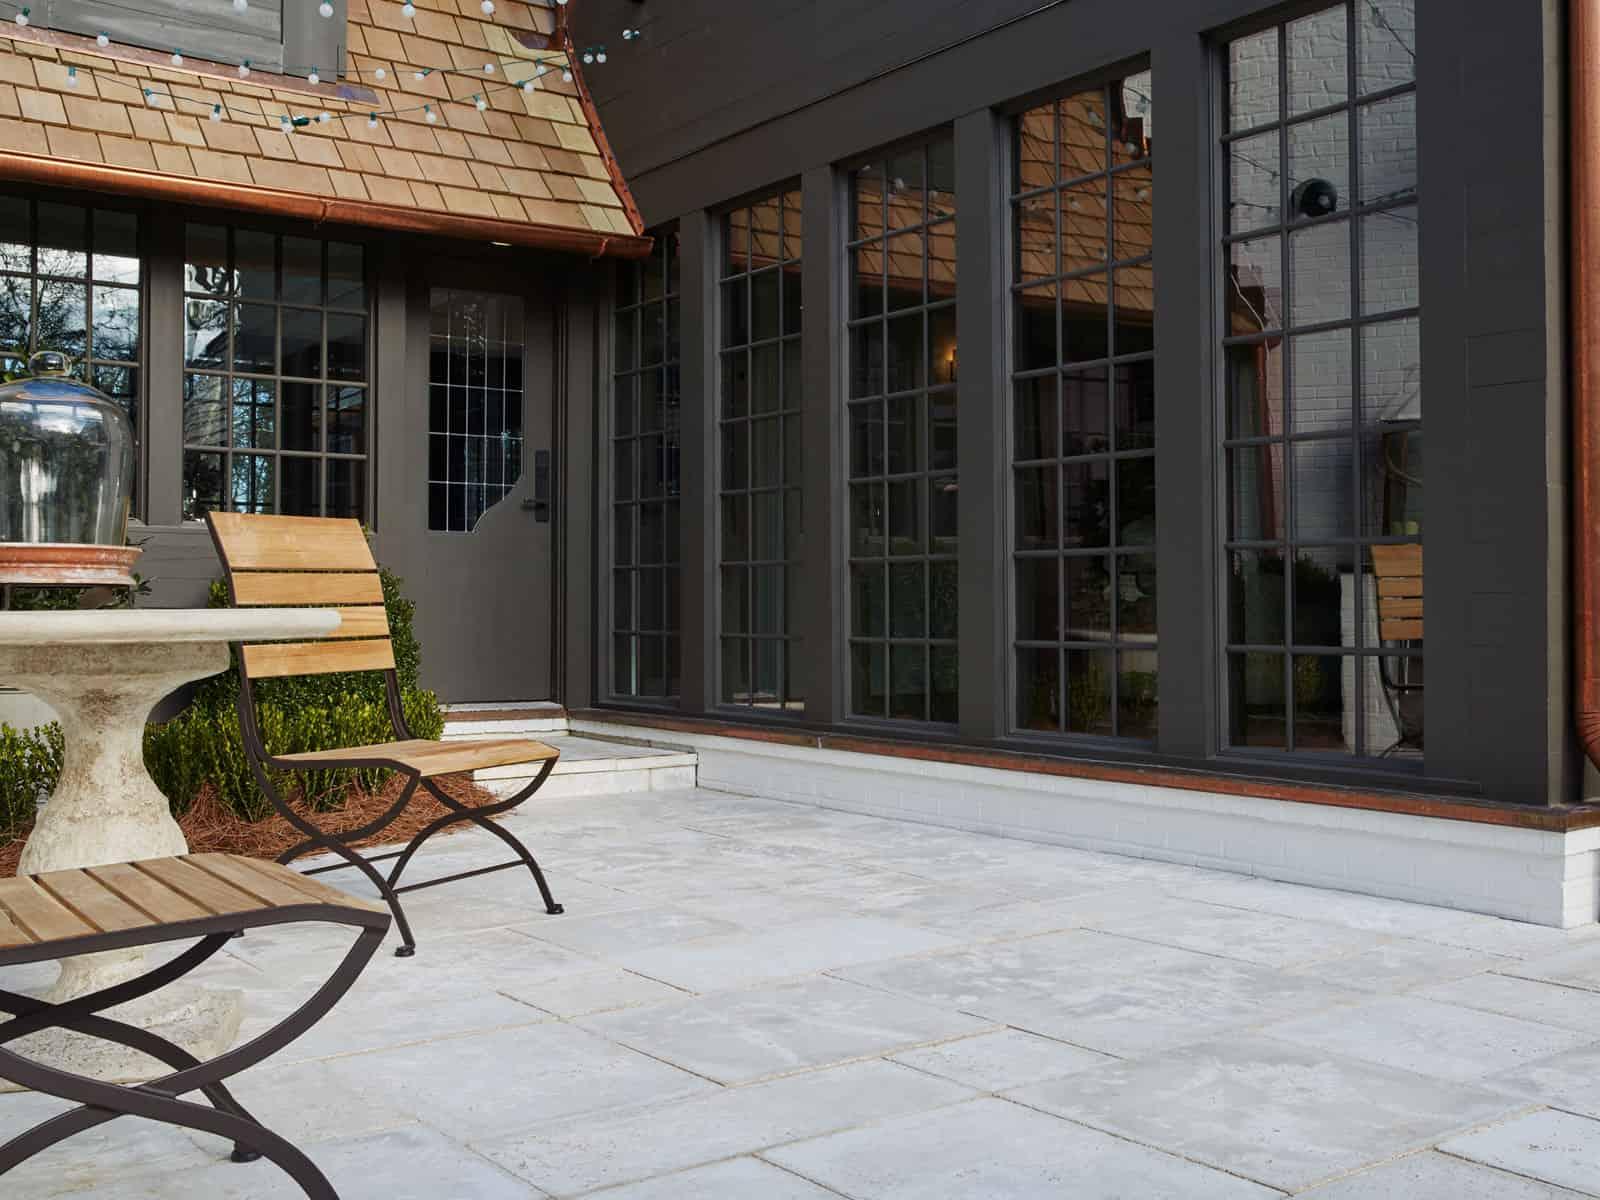 Patios With Concrete Pavers